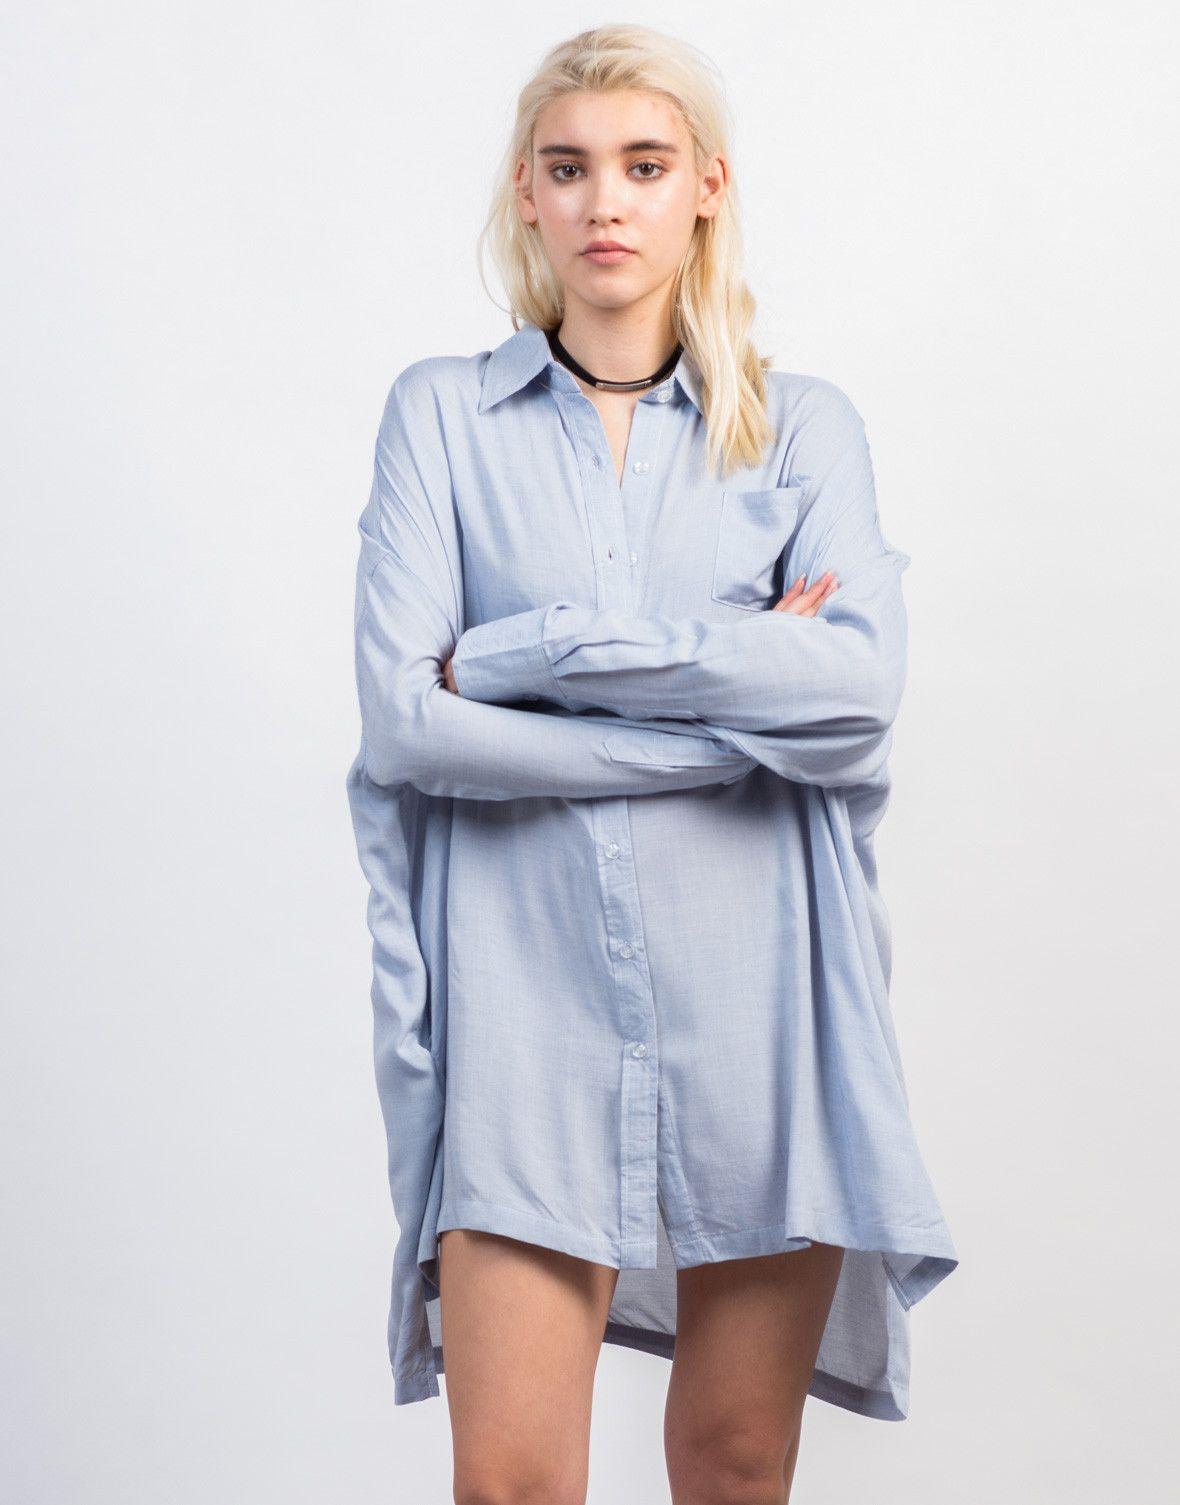 45079c5a11c8 Oversized Button Up Shirt | wants | Shirts, Button up shirts, Denim ...